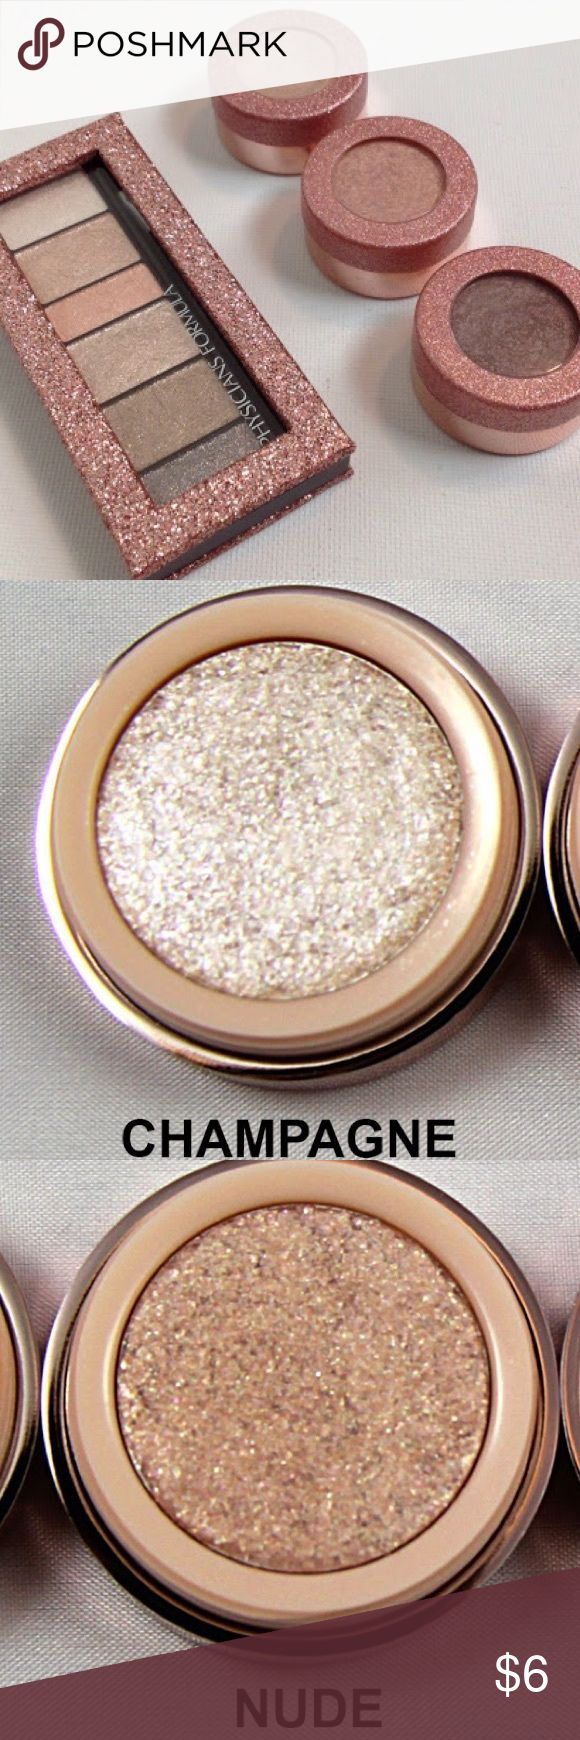 Physician Formula Shimmer Cream Eyeshadow Nude Duo Physicians Formula Extreme Shimmer Gel Cream Eyeshadow Nude Set • TWO COLORS LEFT-- NUDE & CHAMPAGNE Makeup Eyeshadow